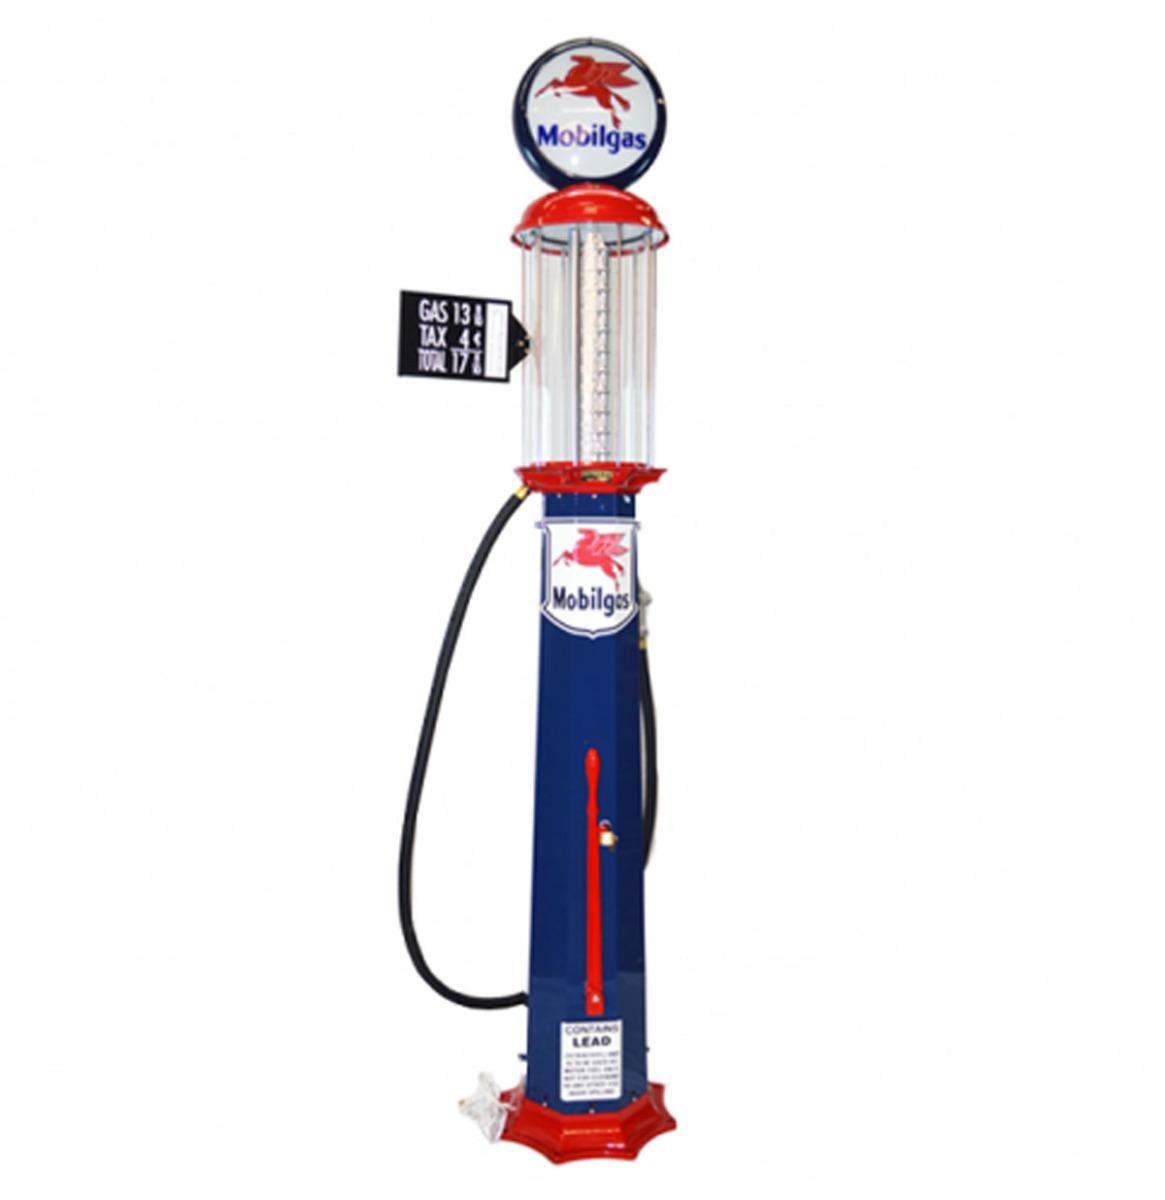 American Mobilgas 10 Gallon Benzinepomp - Blauw & Rood - Reproductie